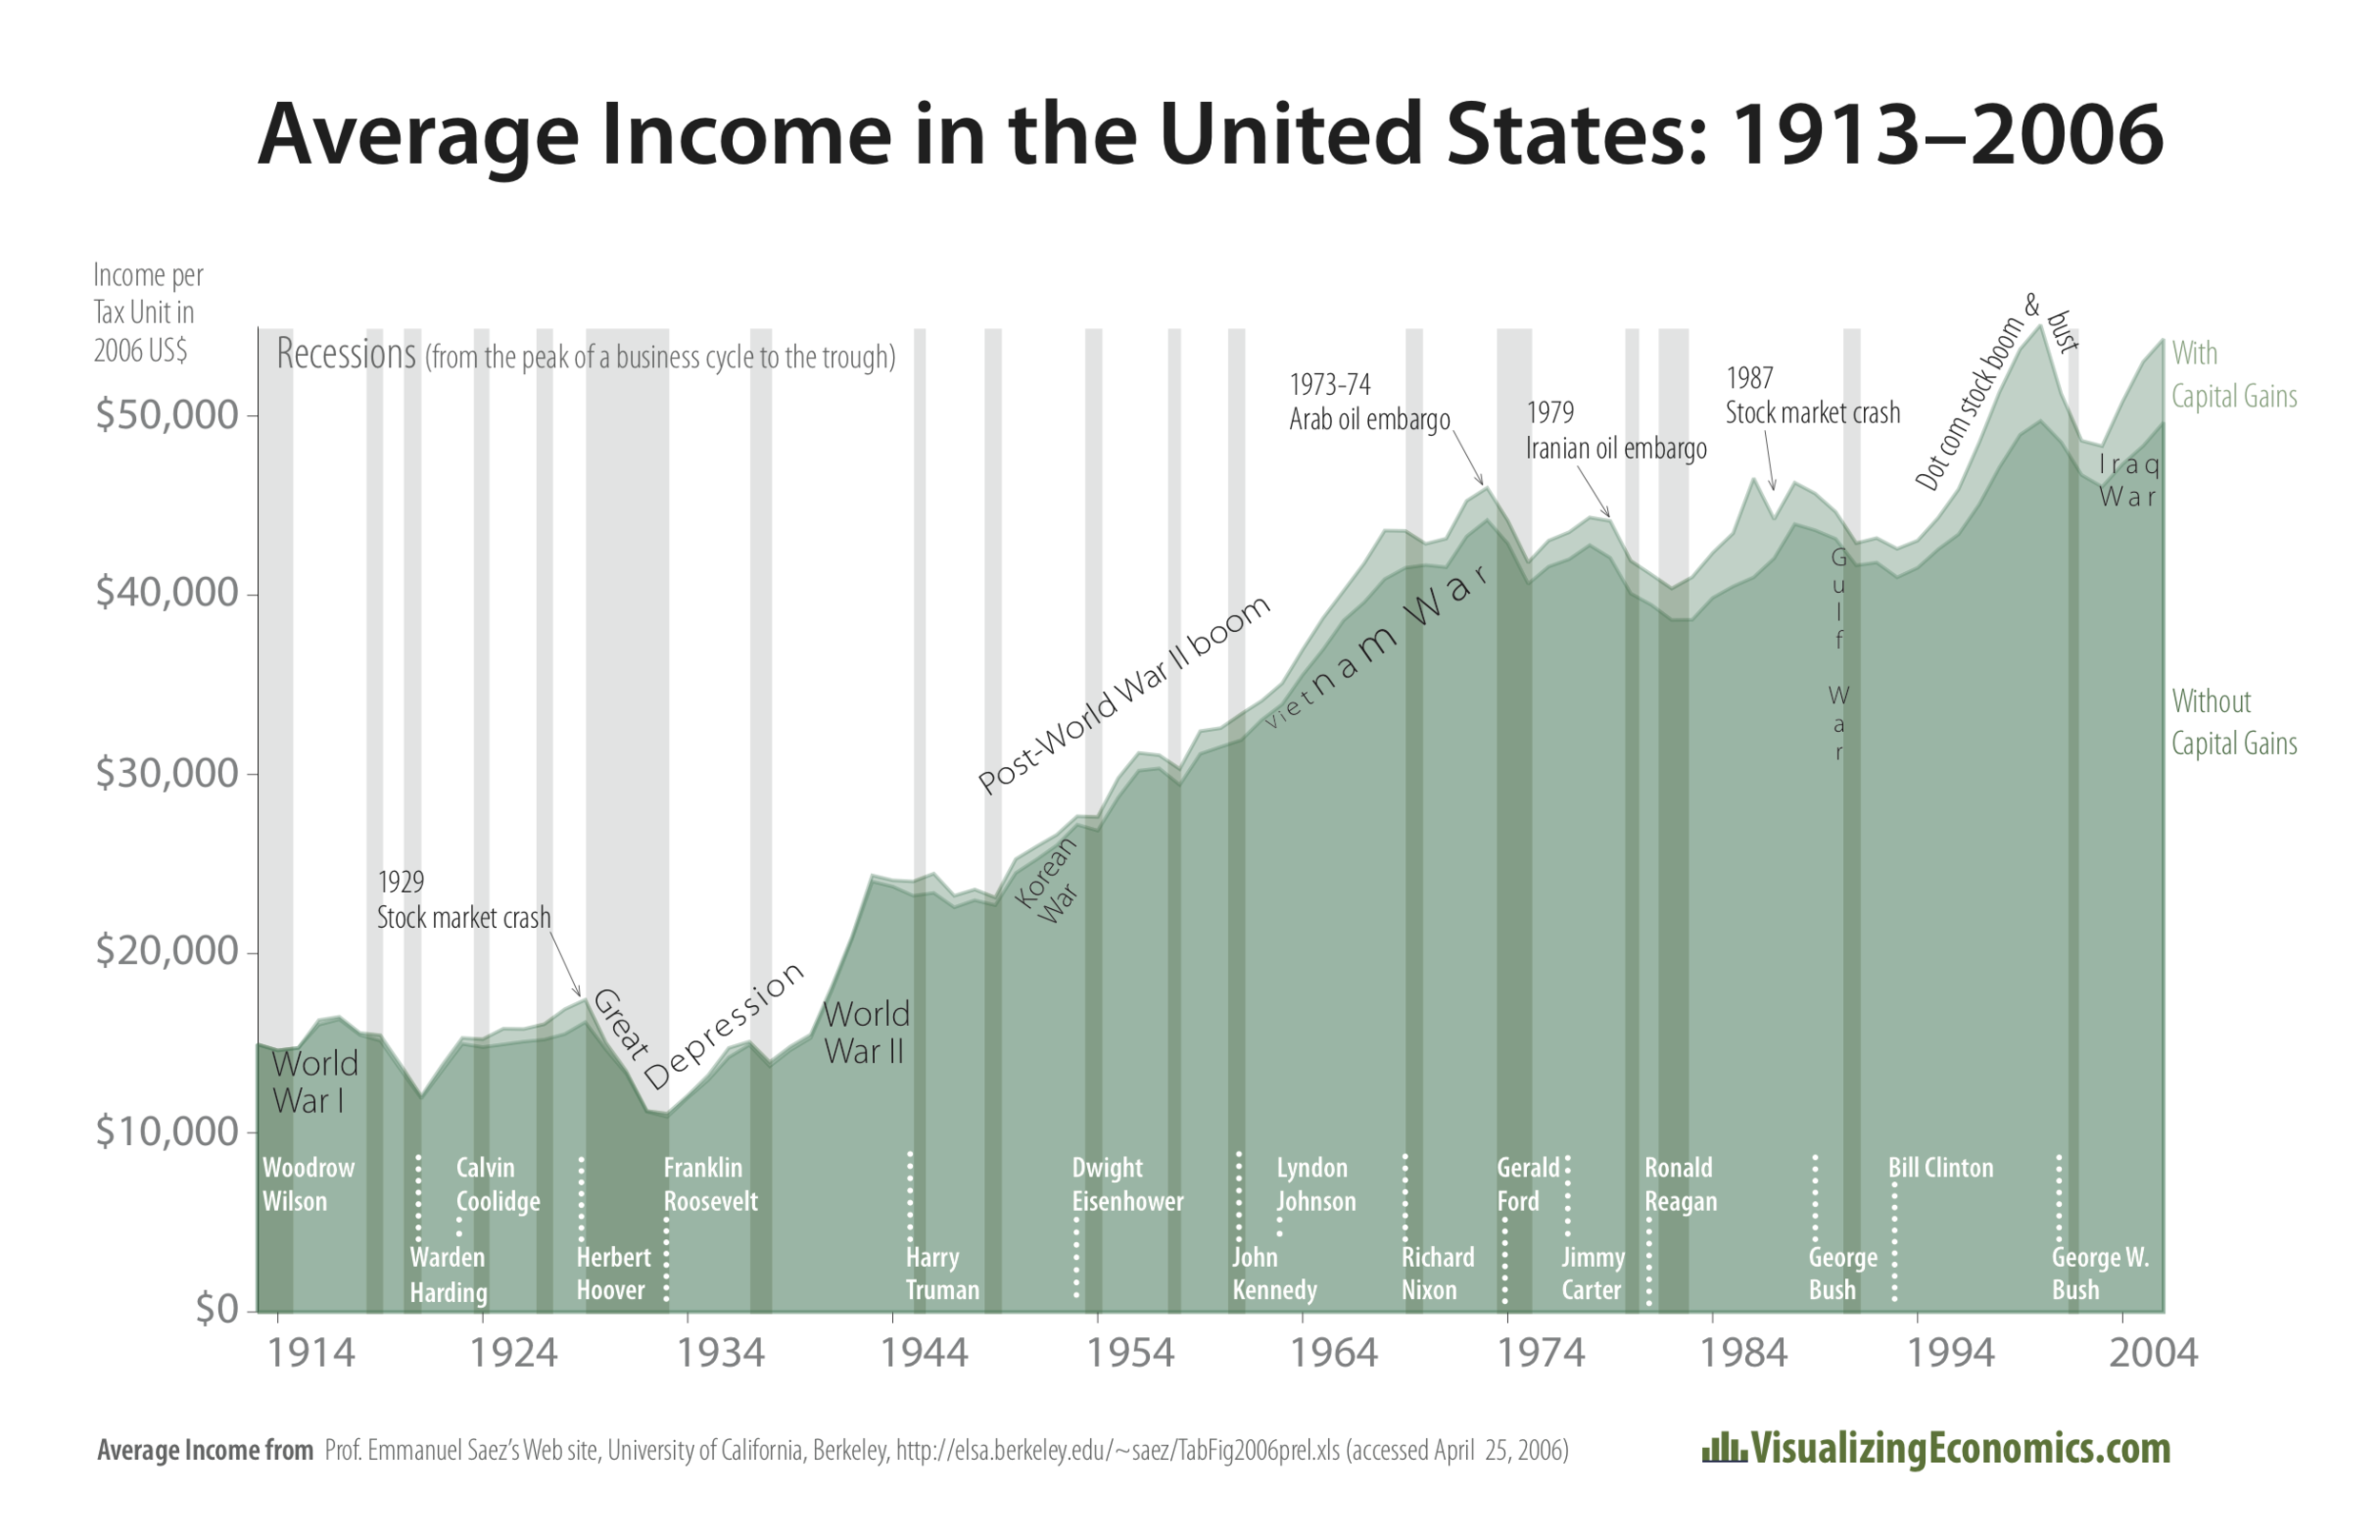 Average Income in the United States